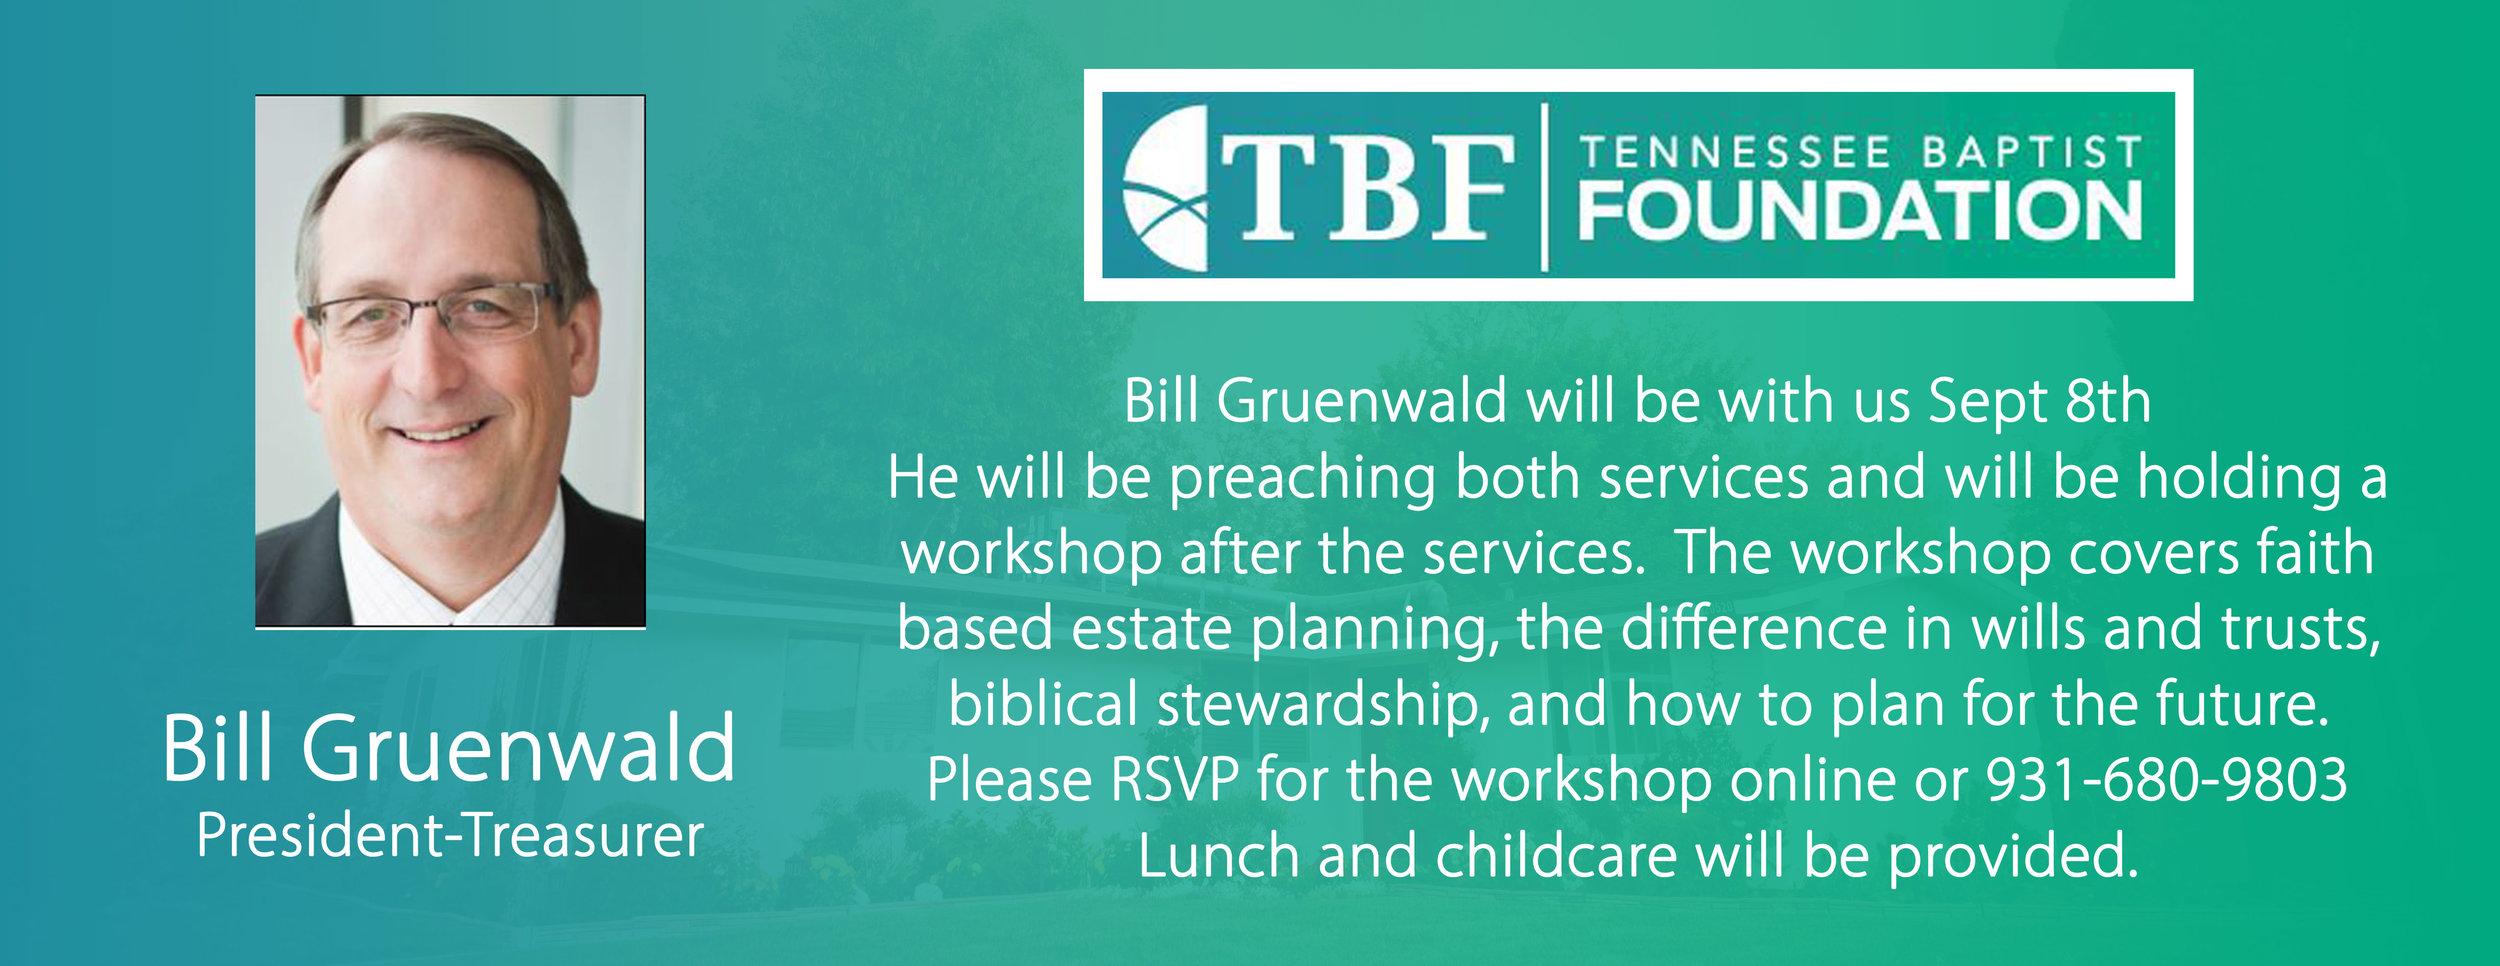 Bill Gruenwald Bulletin.jpg